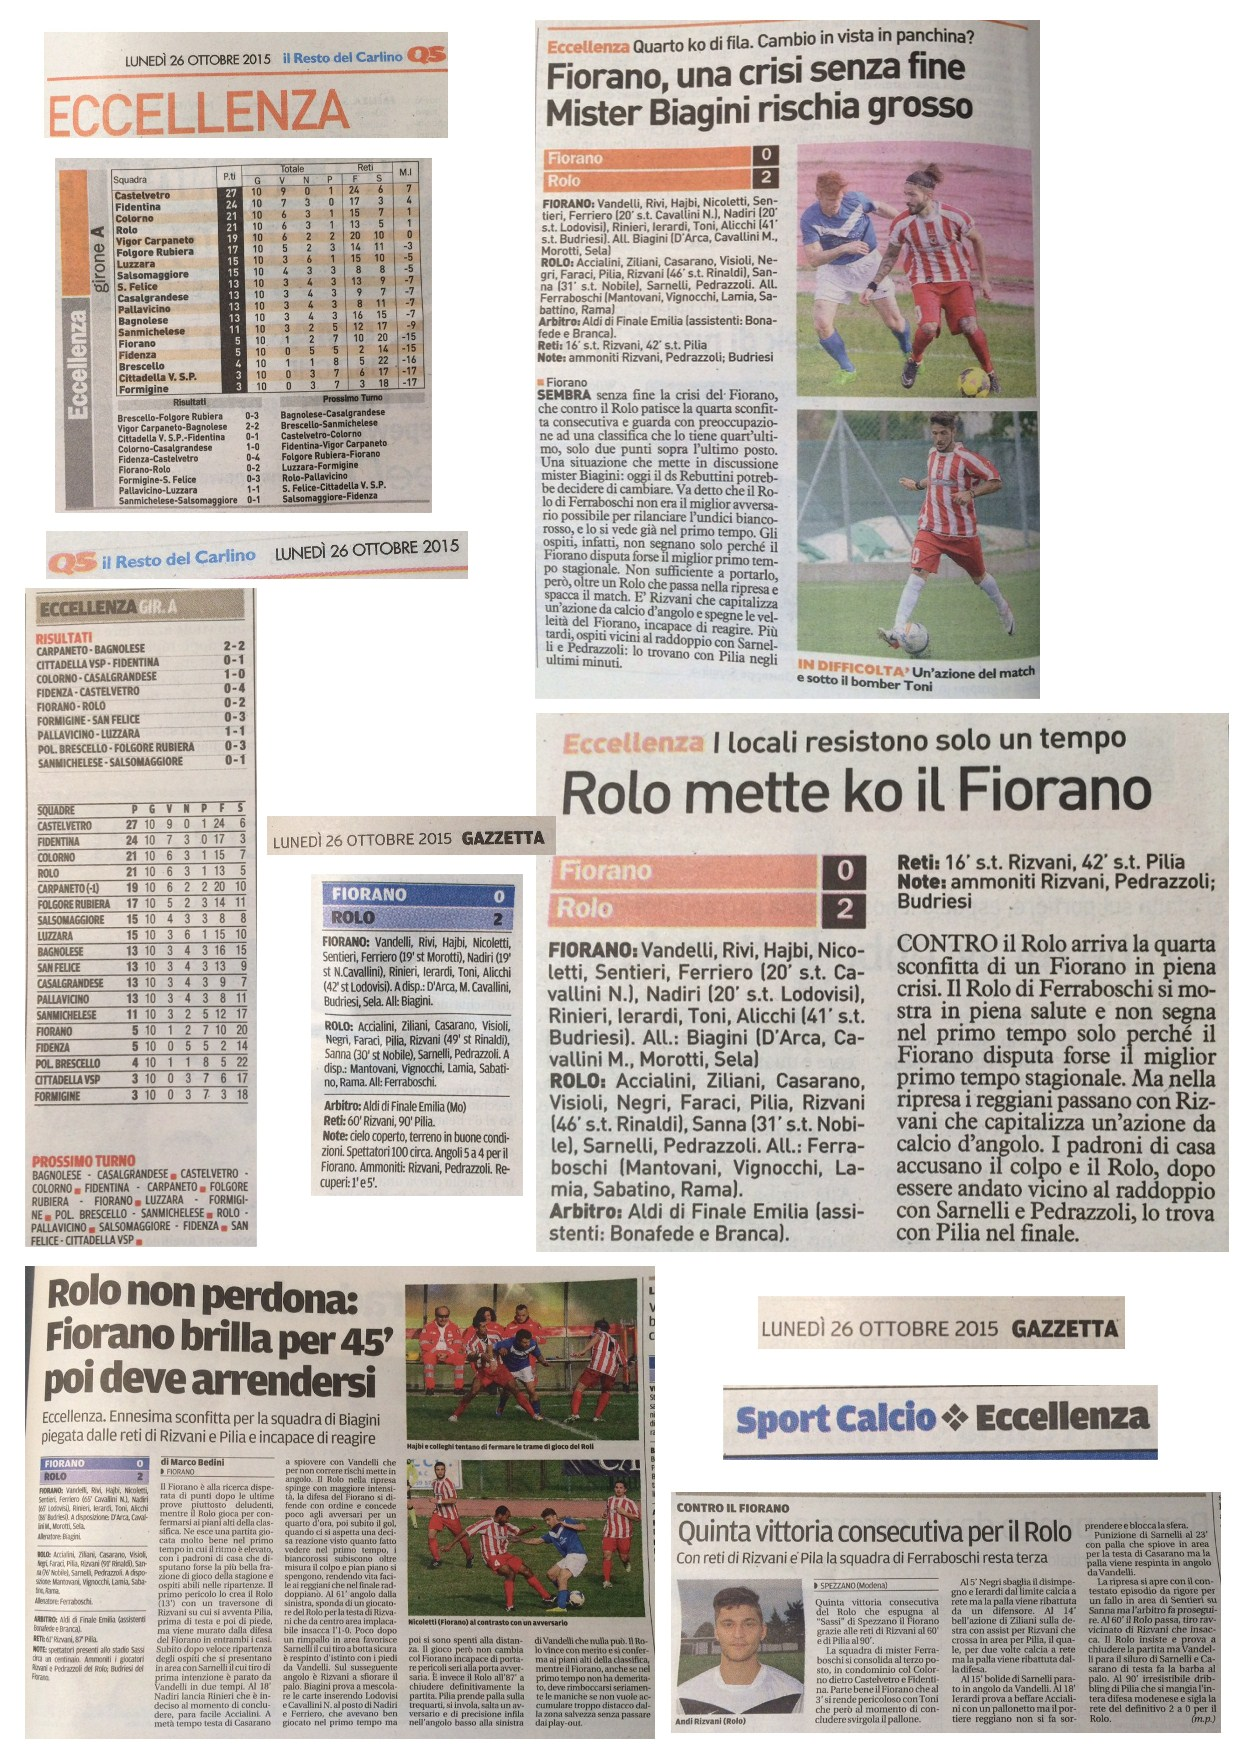 Rassegna Stampa 26 Ottobre 2015 - AC Fiorano (1^ Parte)